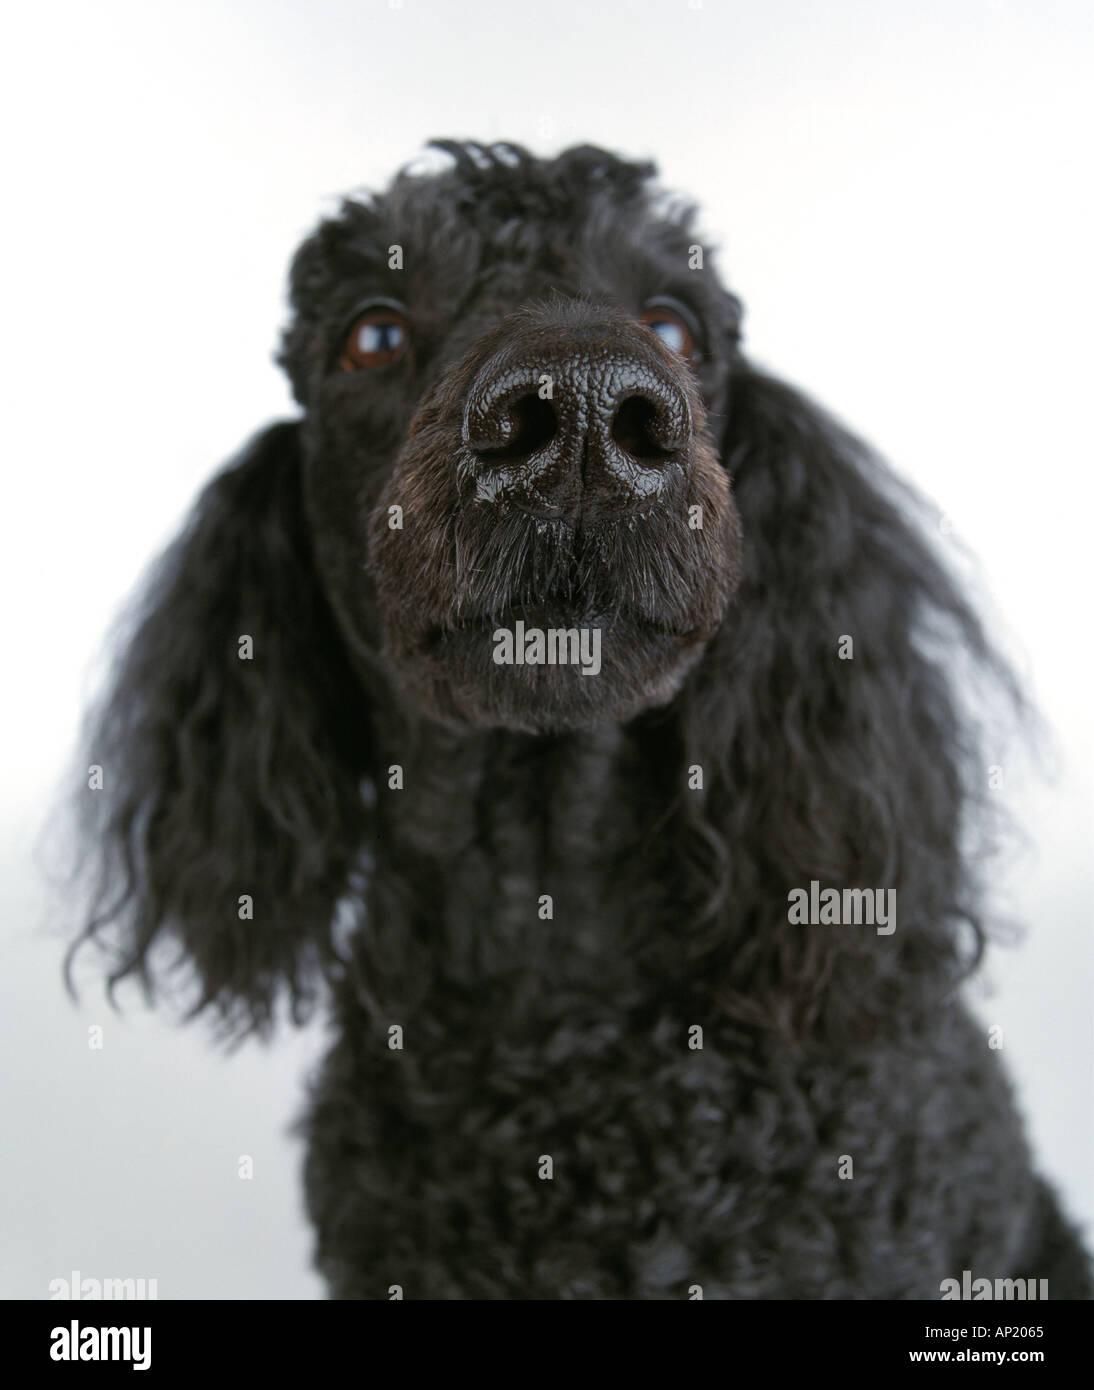 black poodle - Stock Image